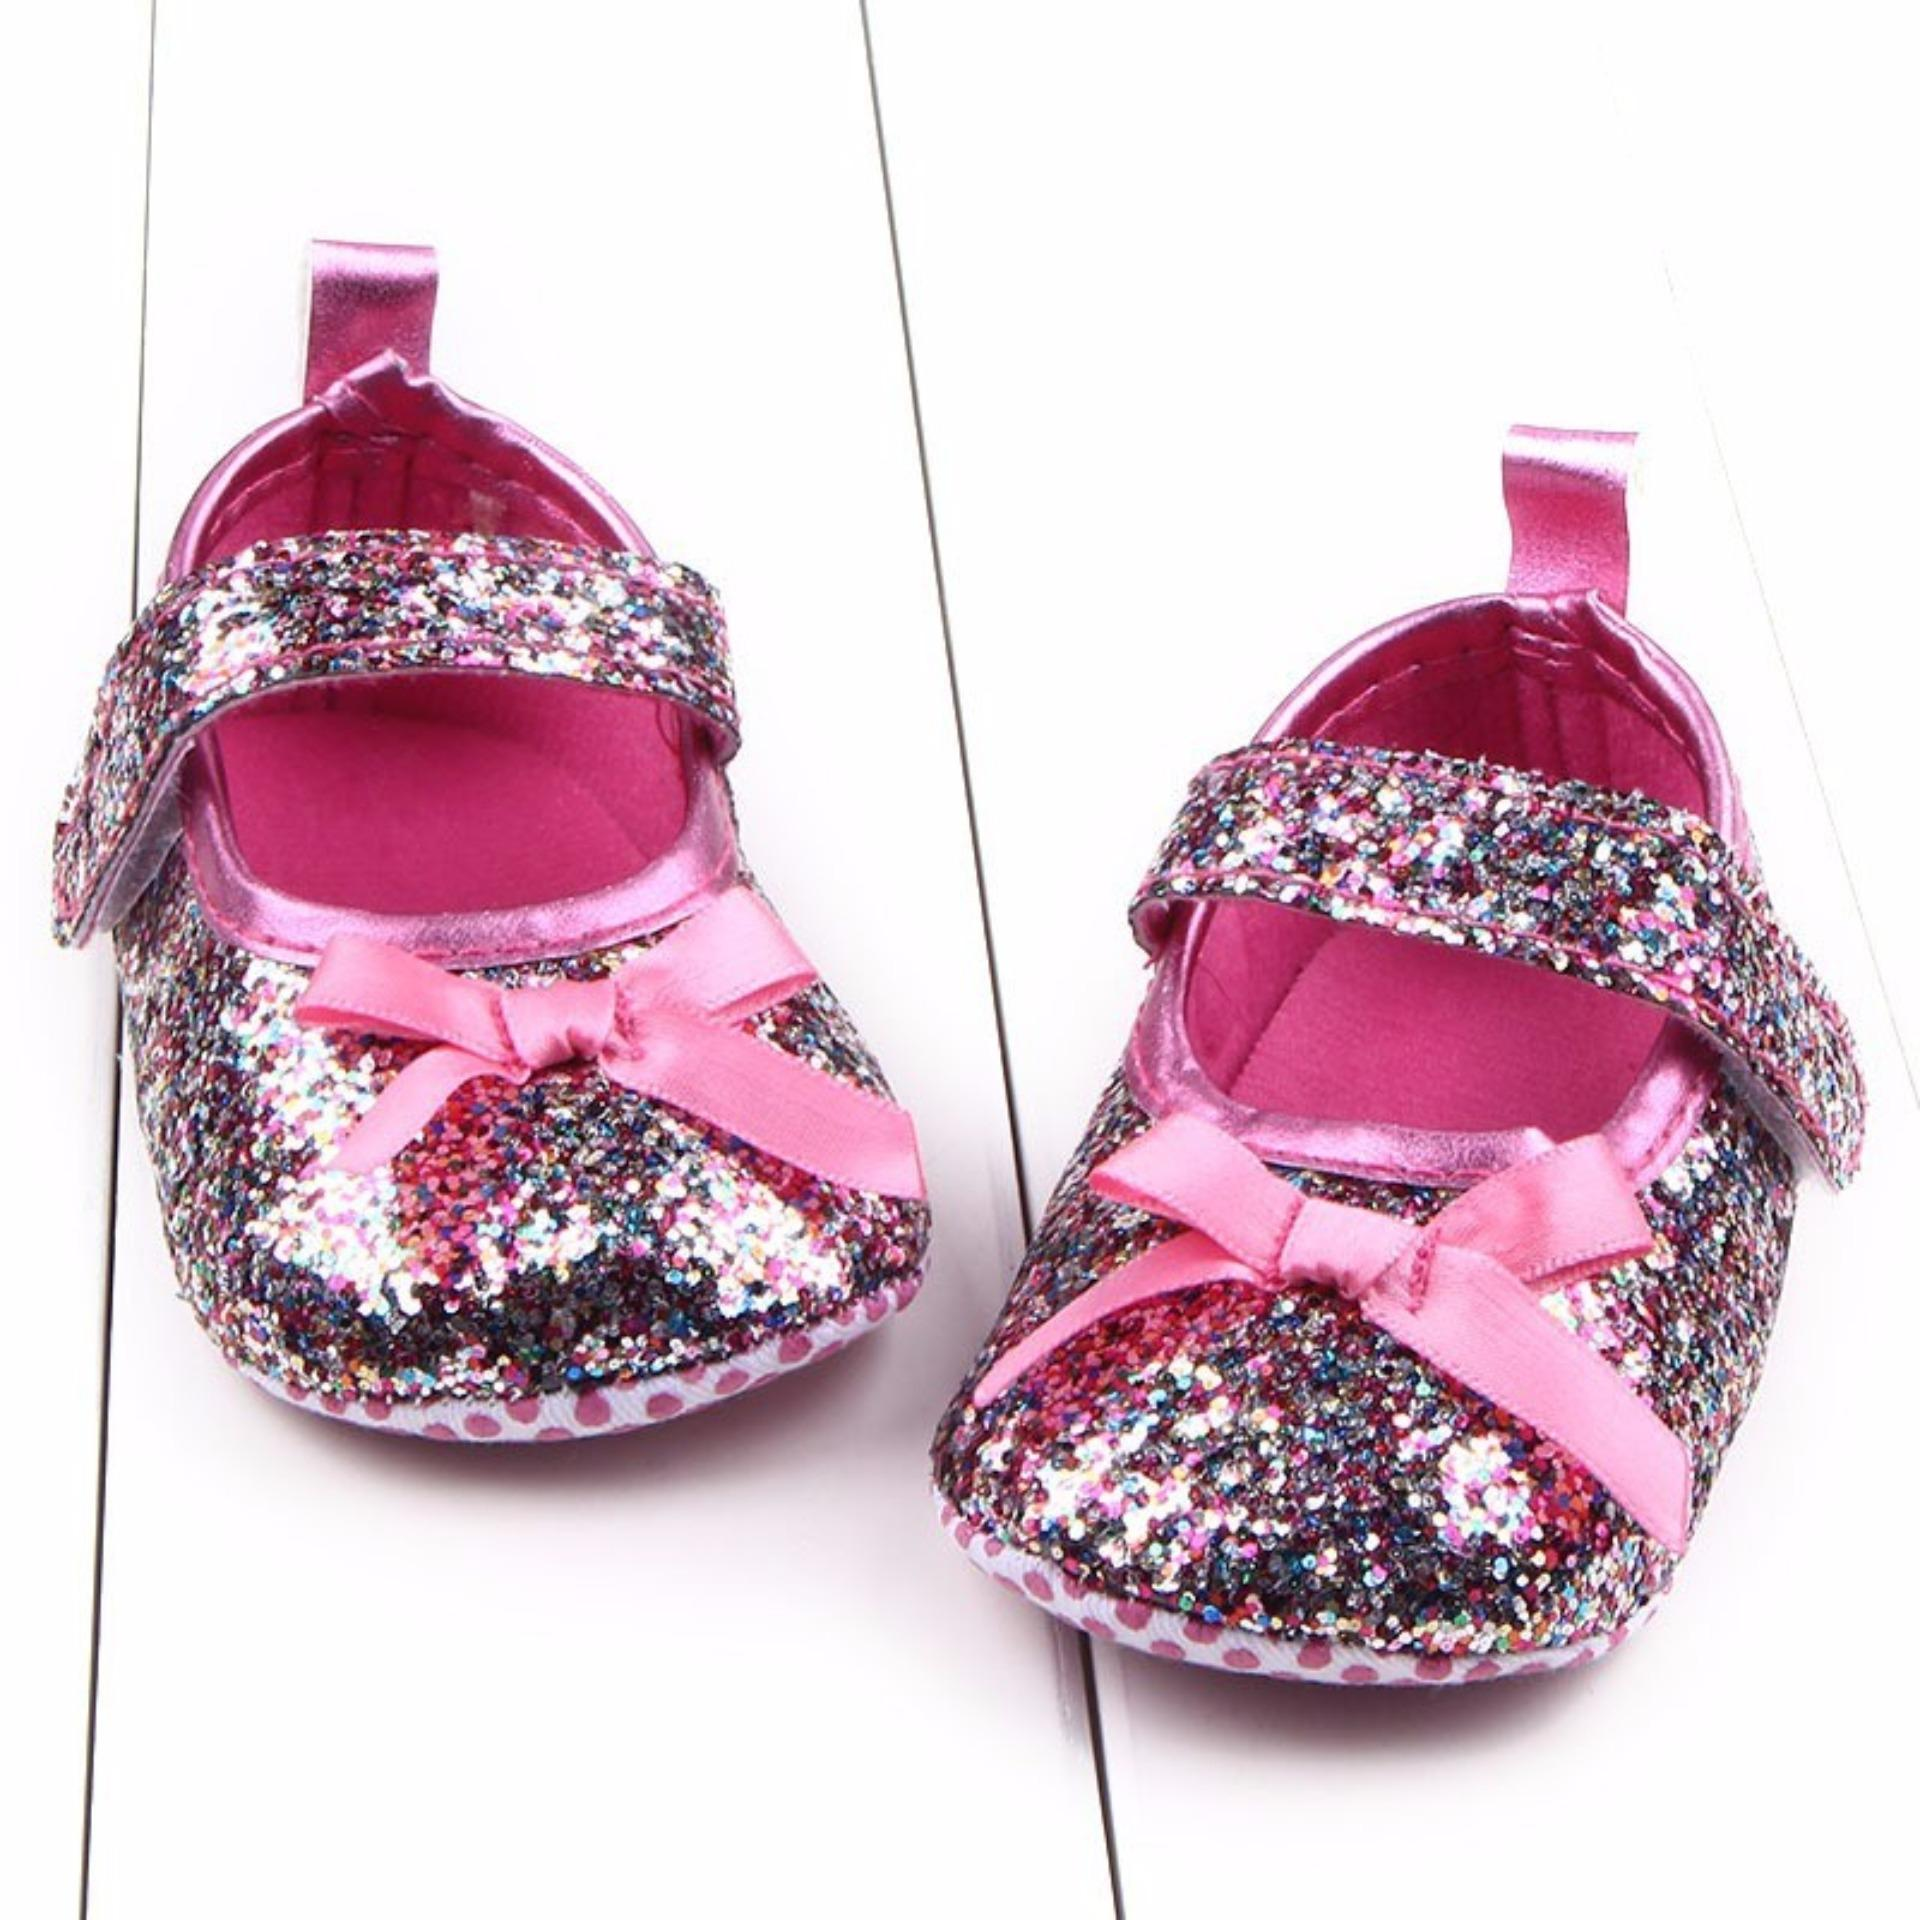 Girls. Shoes. Flats & Slip-Ons. Boots. Sneakers. Flip Flops, Slides & Sandals